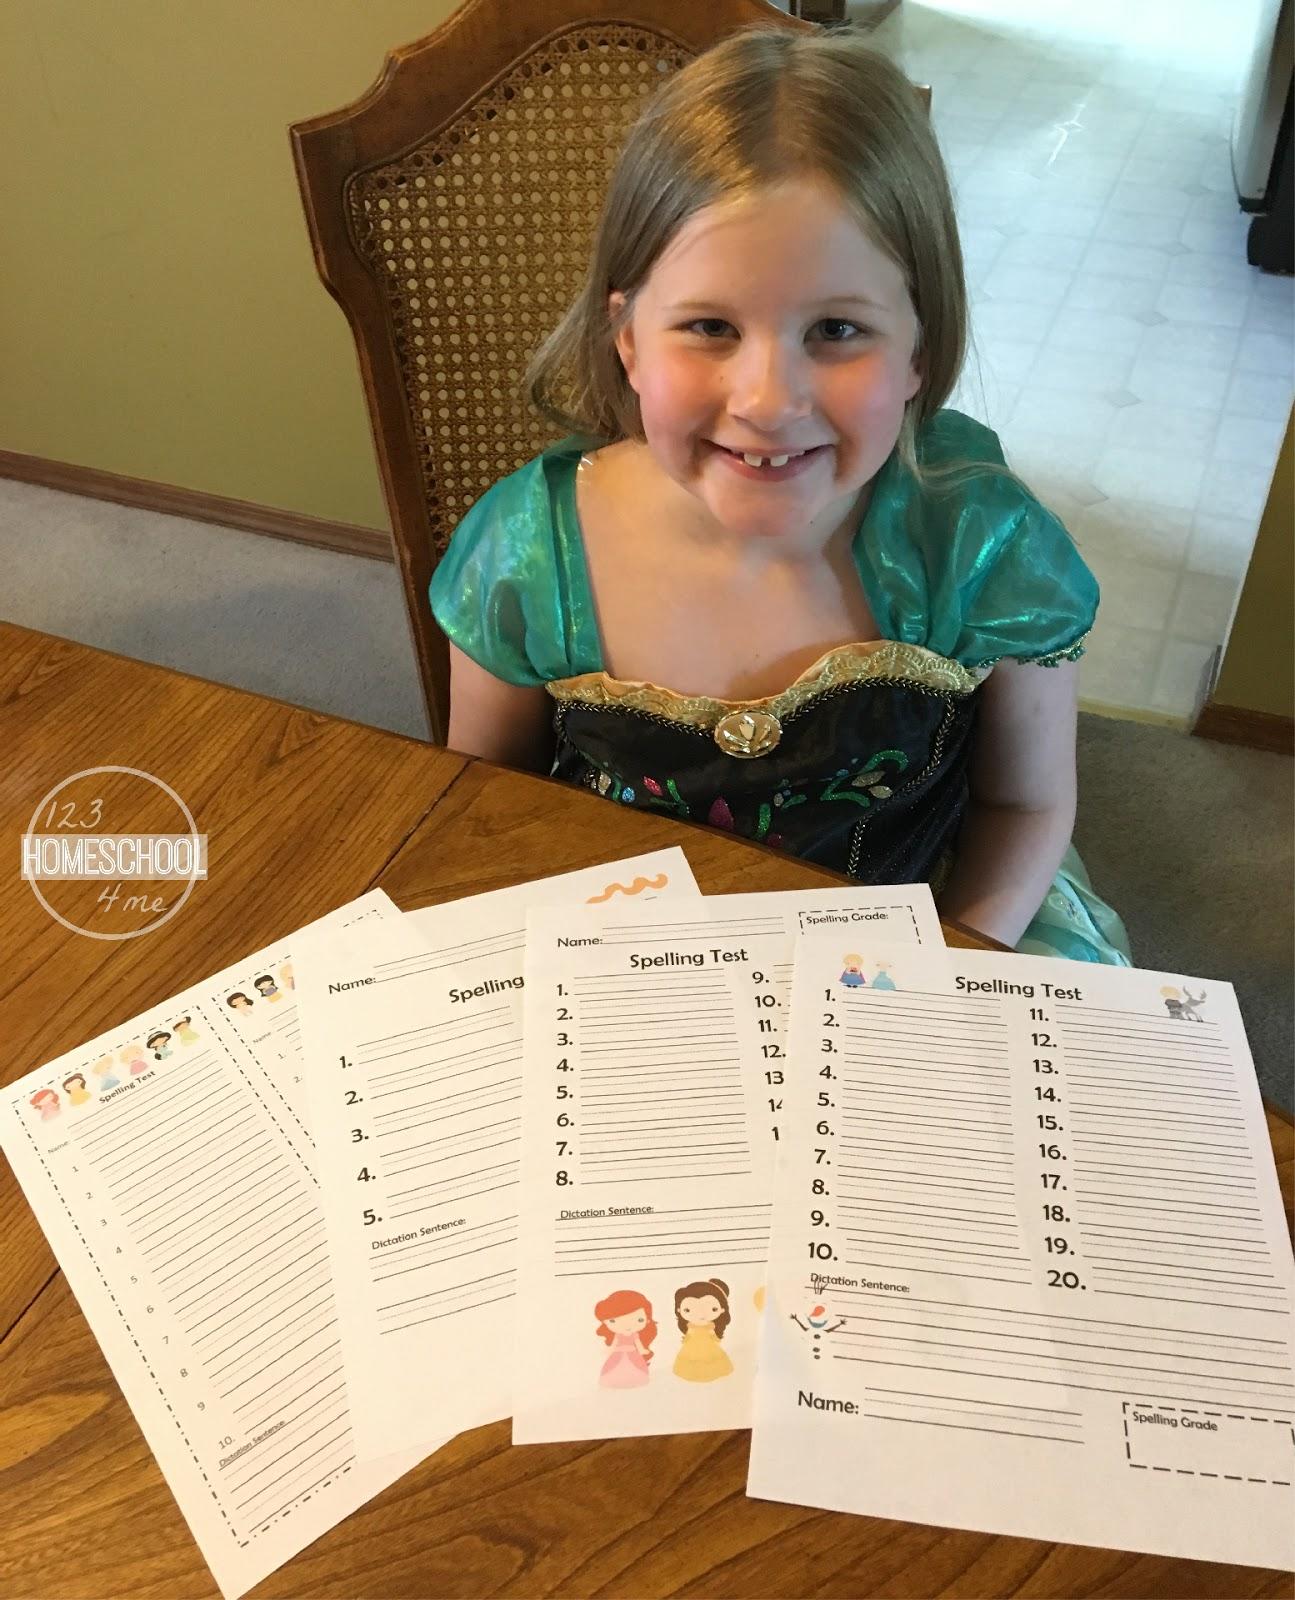 Princess Spelling Tests